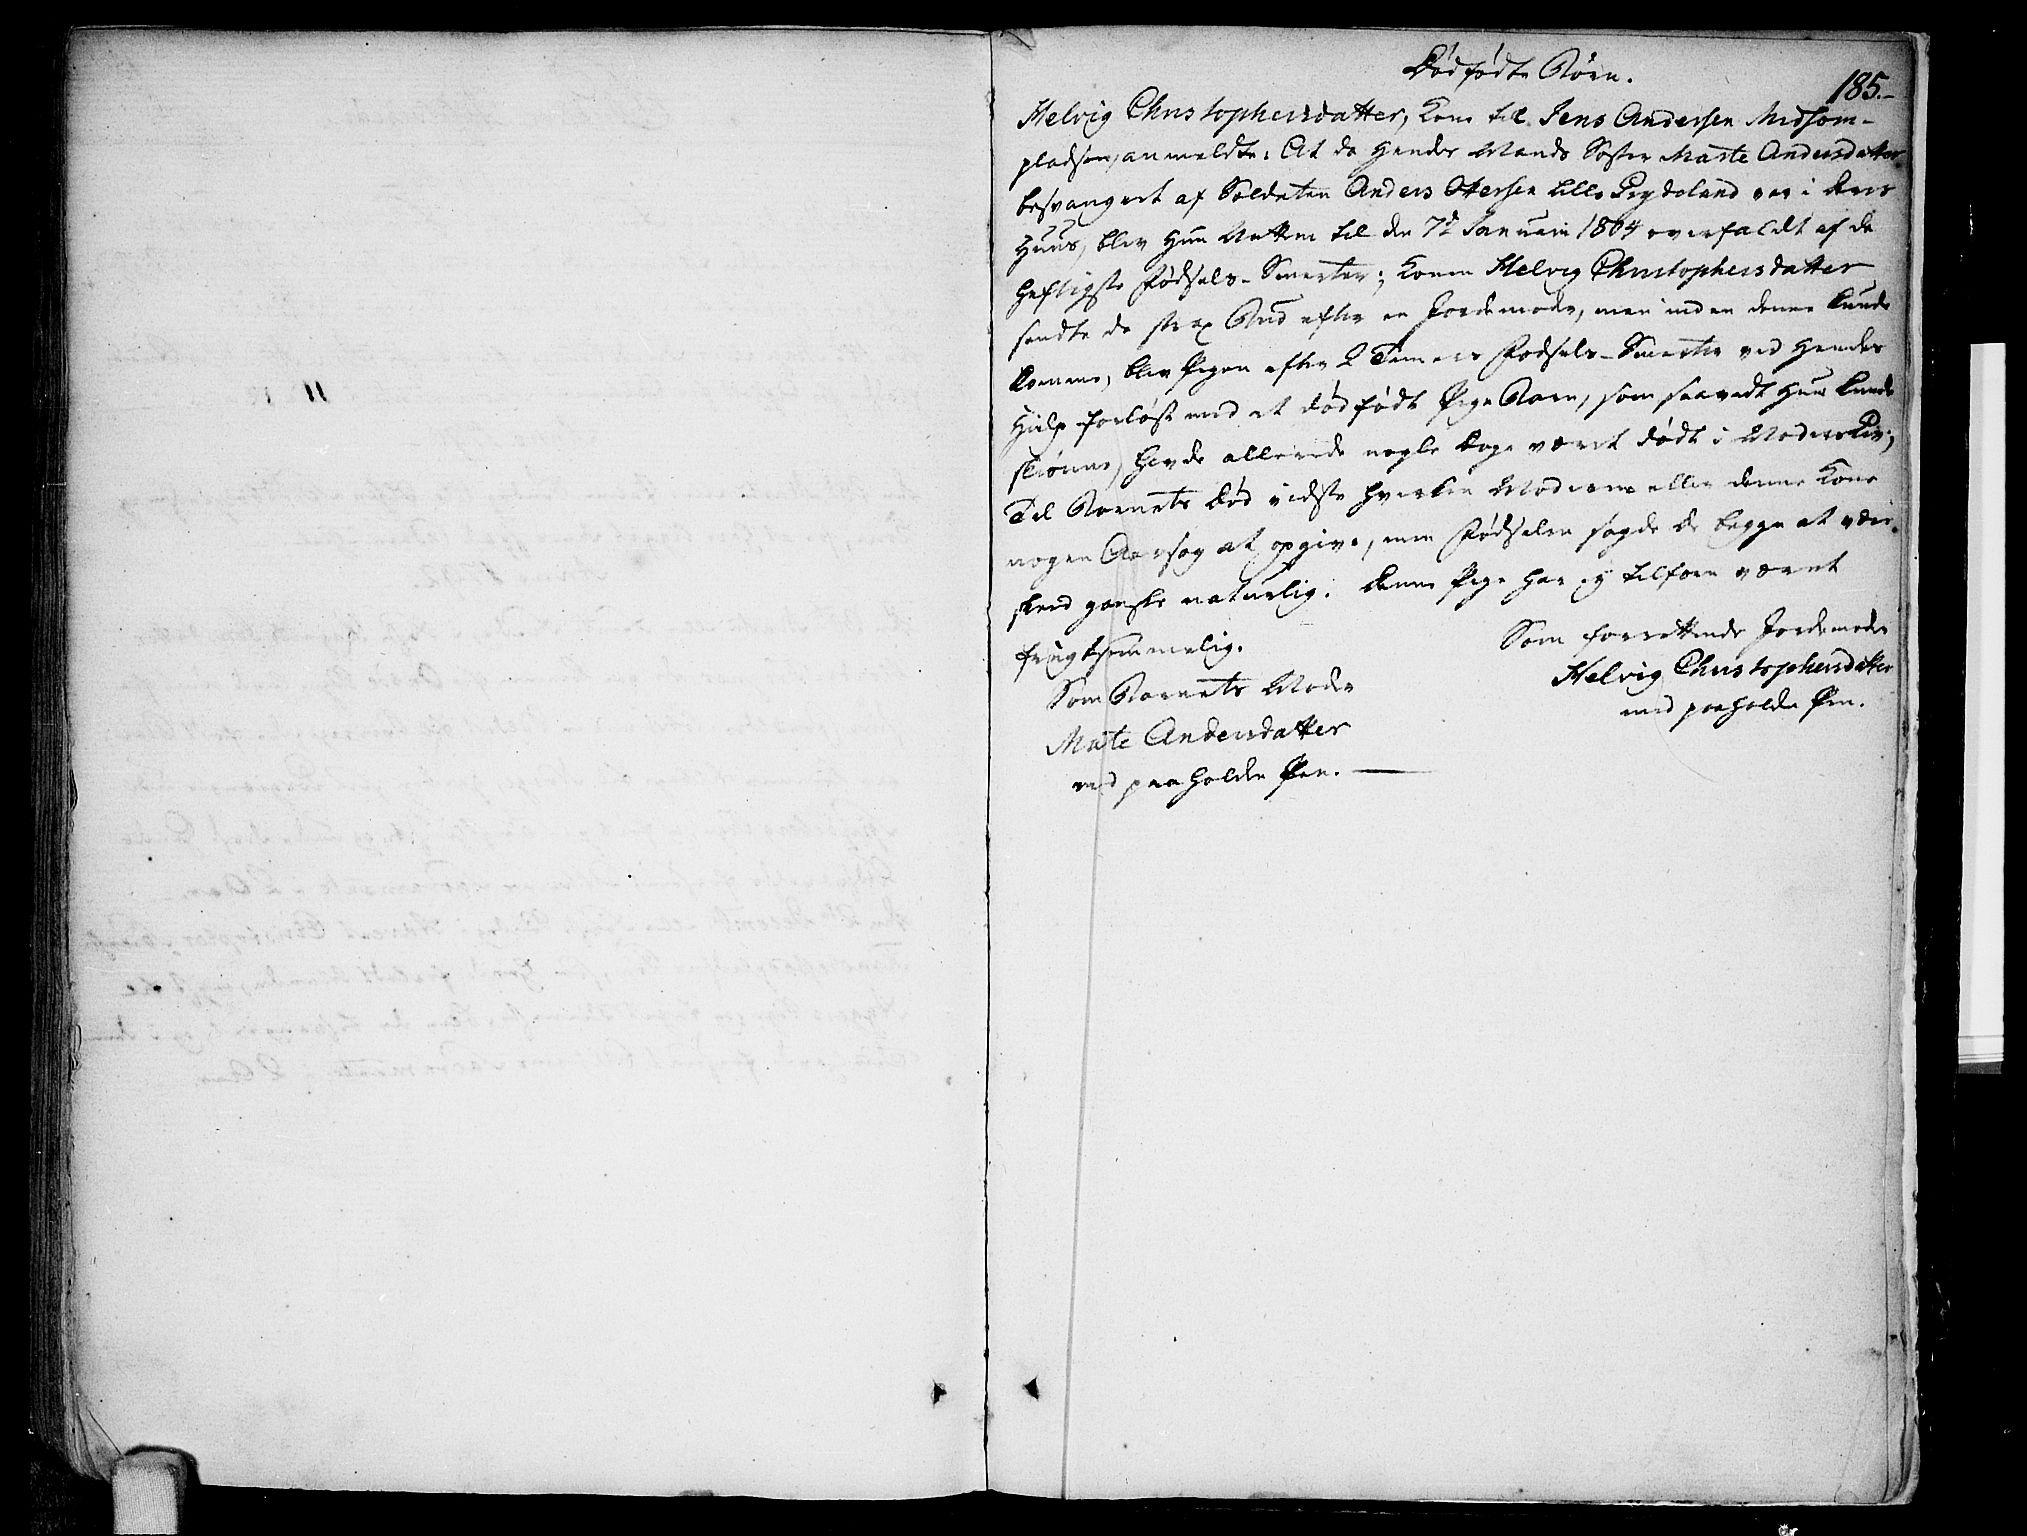 SAO, Kråkstad prestekontor Kirkebøker, F/Fa/L0002: Ministerialbok nr. I 2, 1786-1814, s. 185